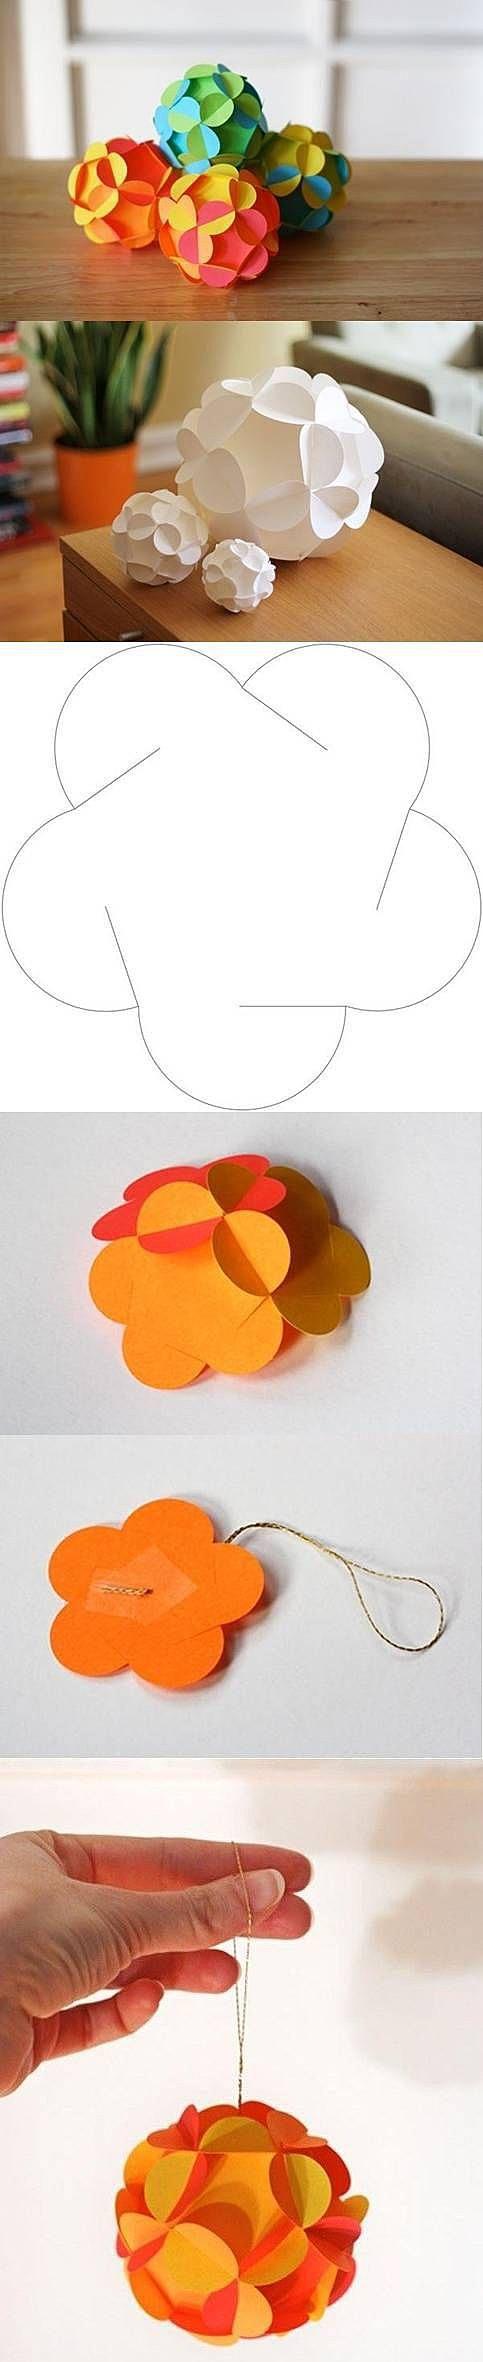 Замысловатые бумажные шары